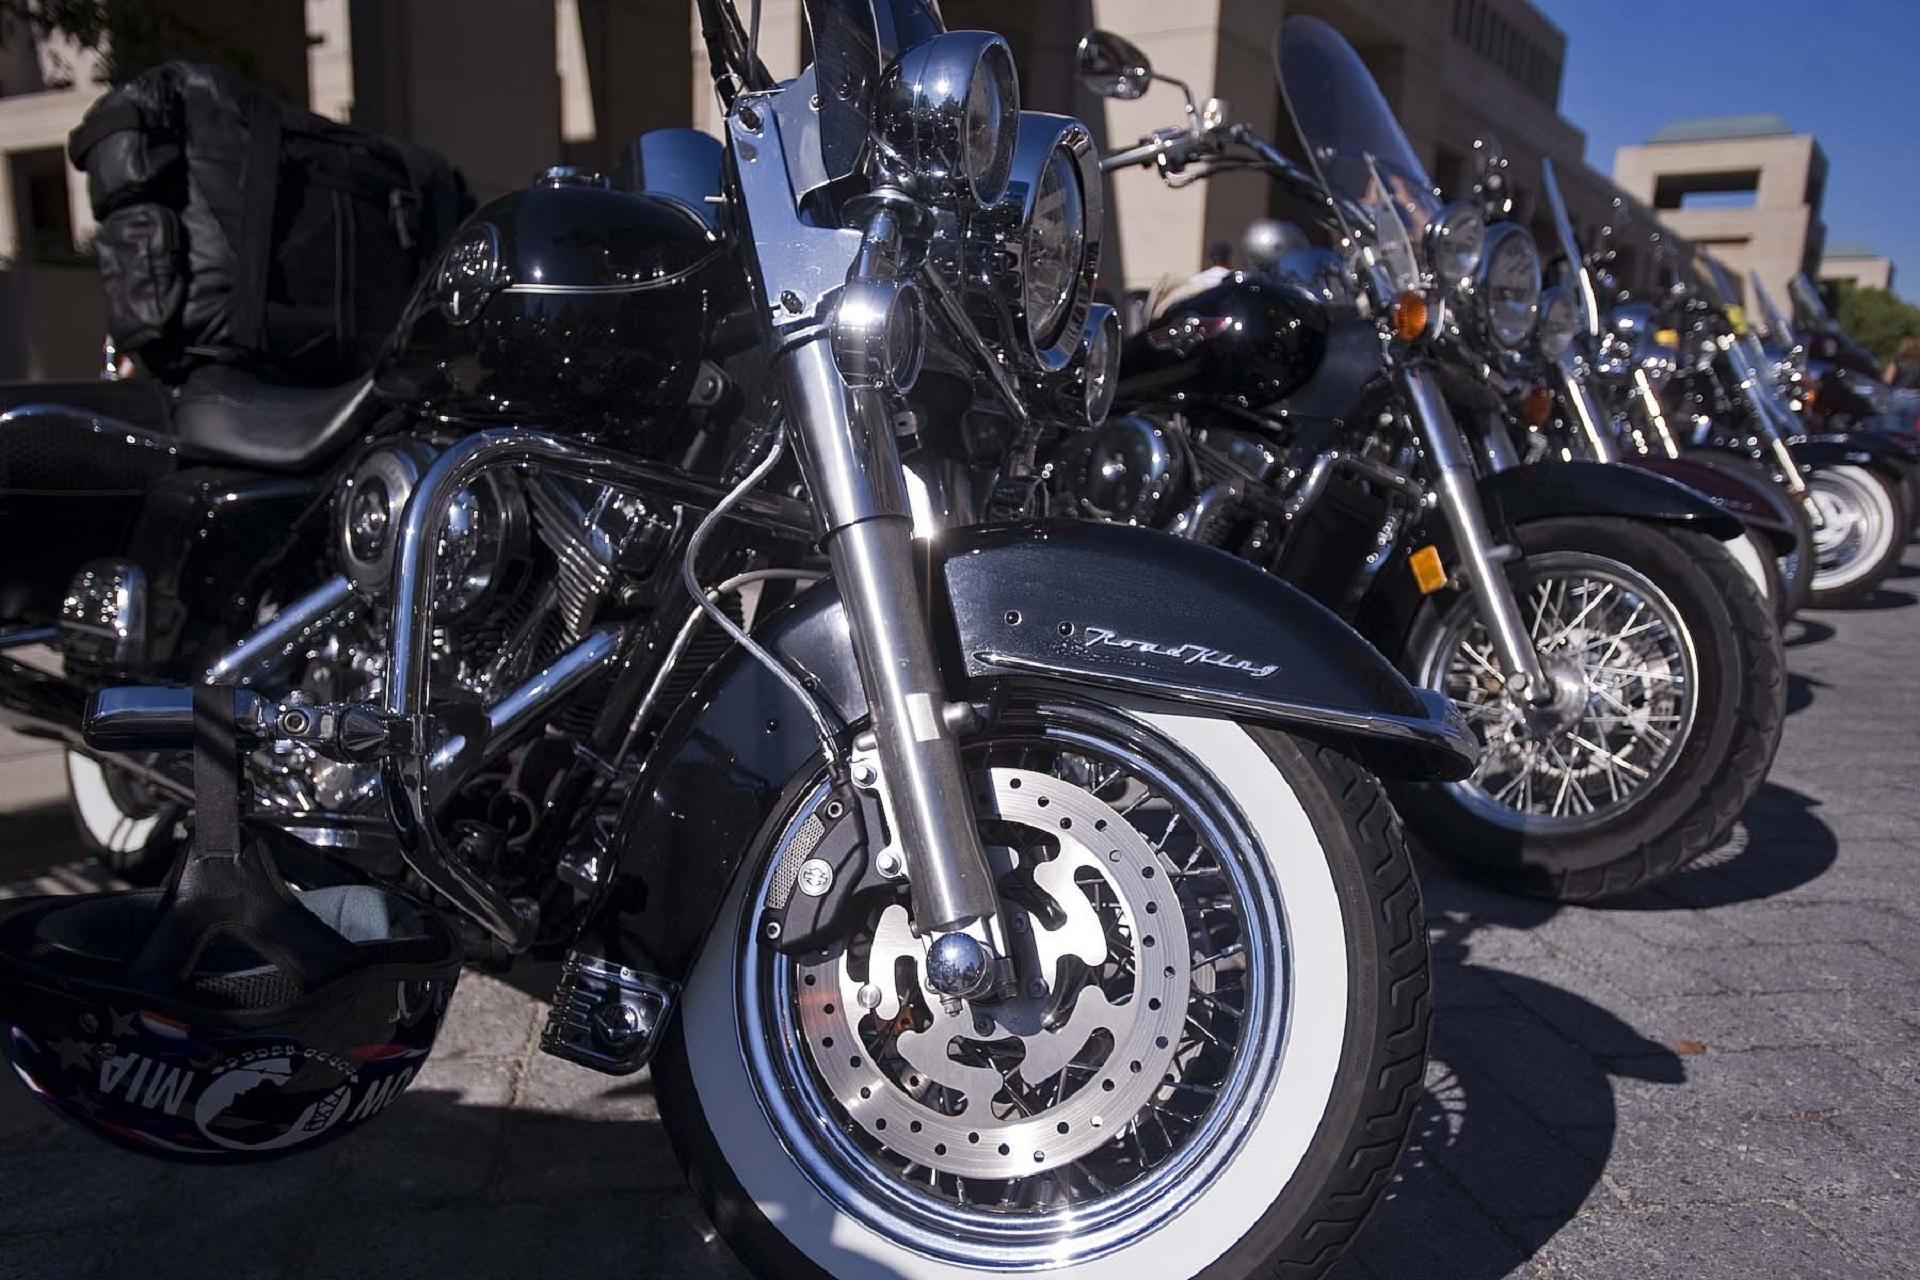 Bike Stand, Bike, Motor, Motorcycle, Parking, HQ Photo